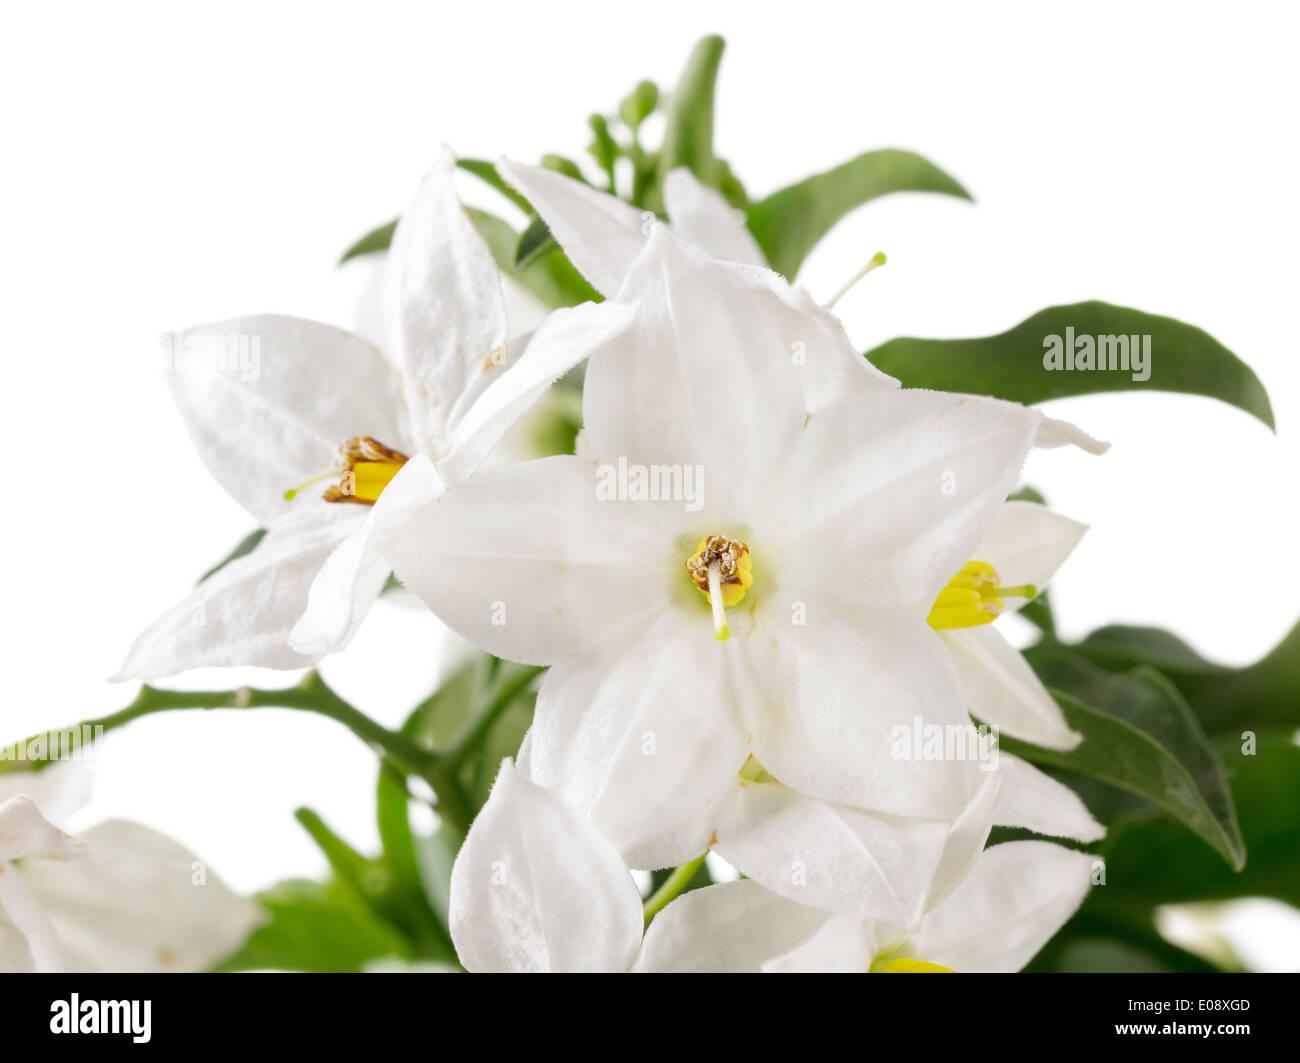 Flowering Jasmine Stock Photos Flowering Jasmine Stock Images Alamy